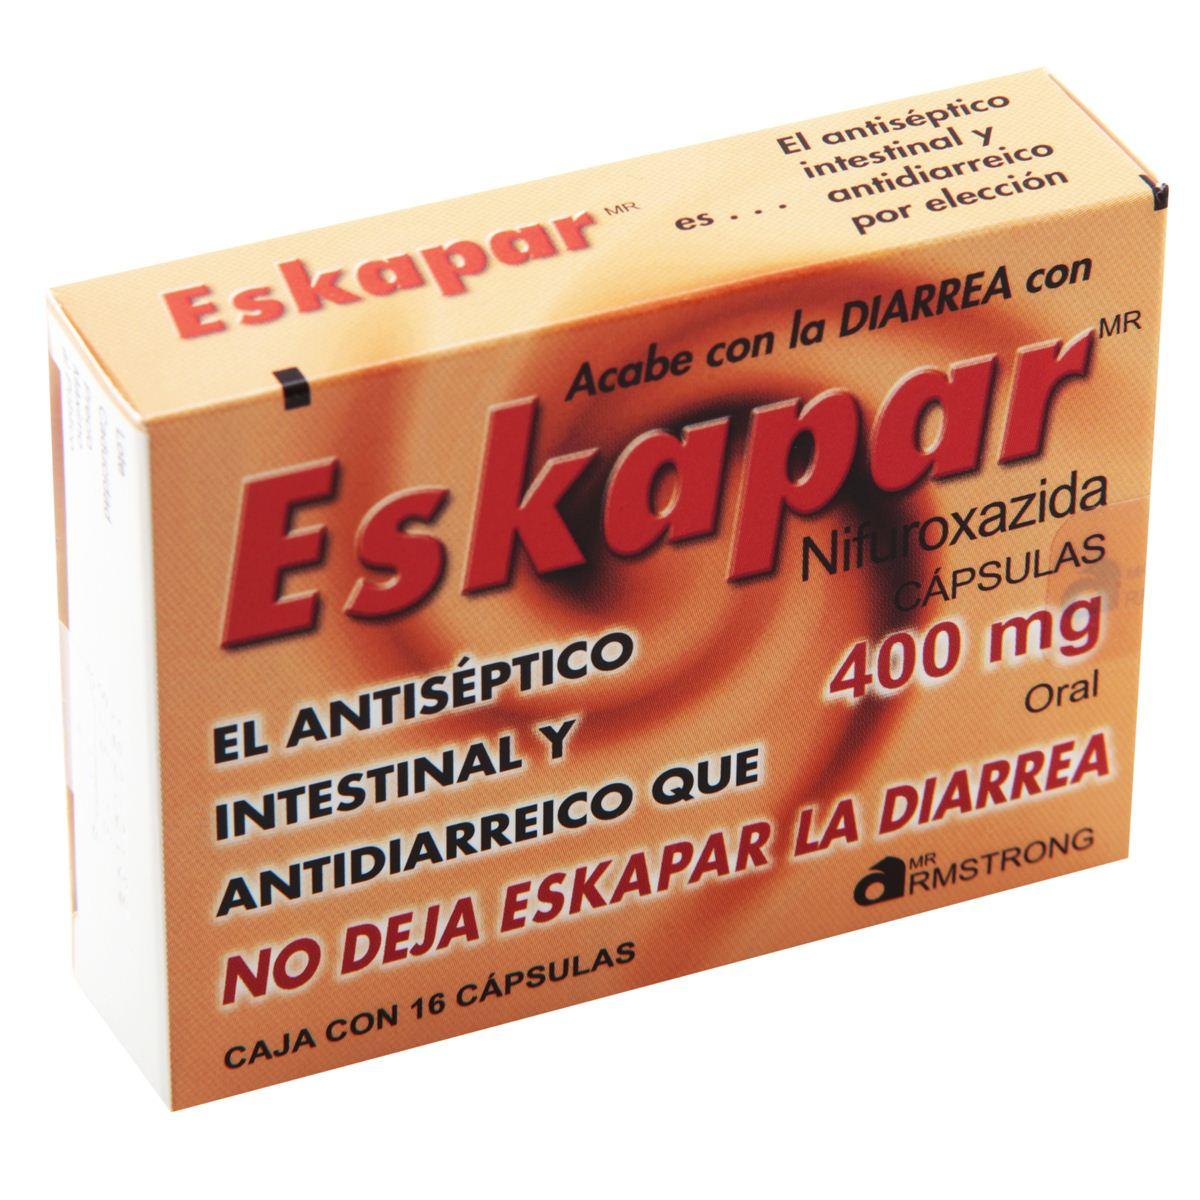 Eskapar con 16 Cápsulas 400 mg